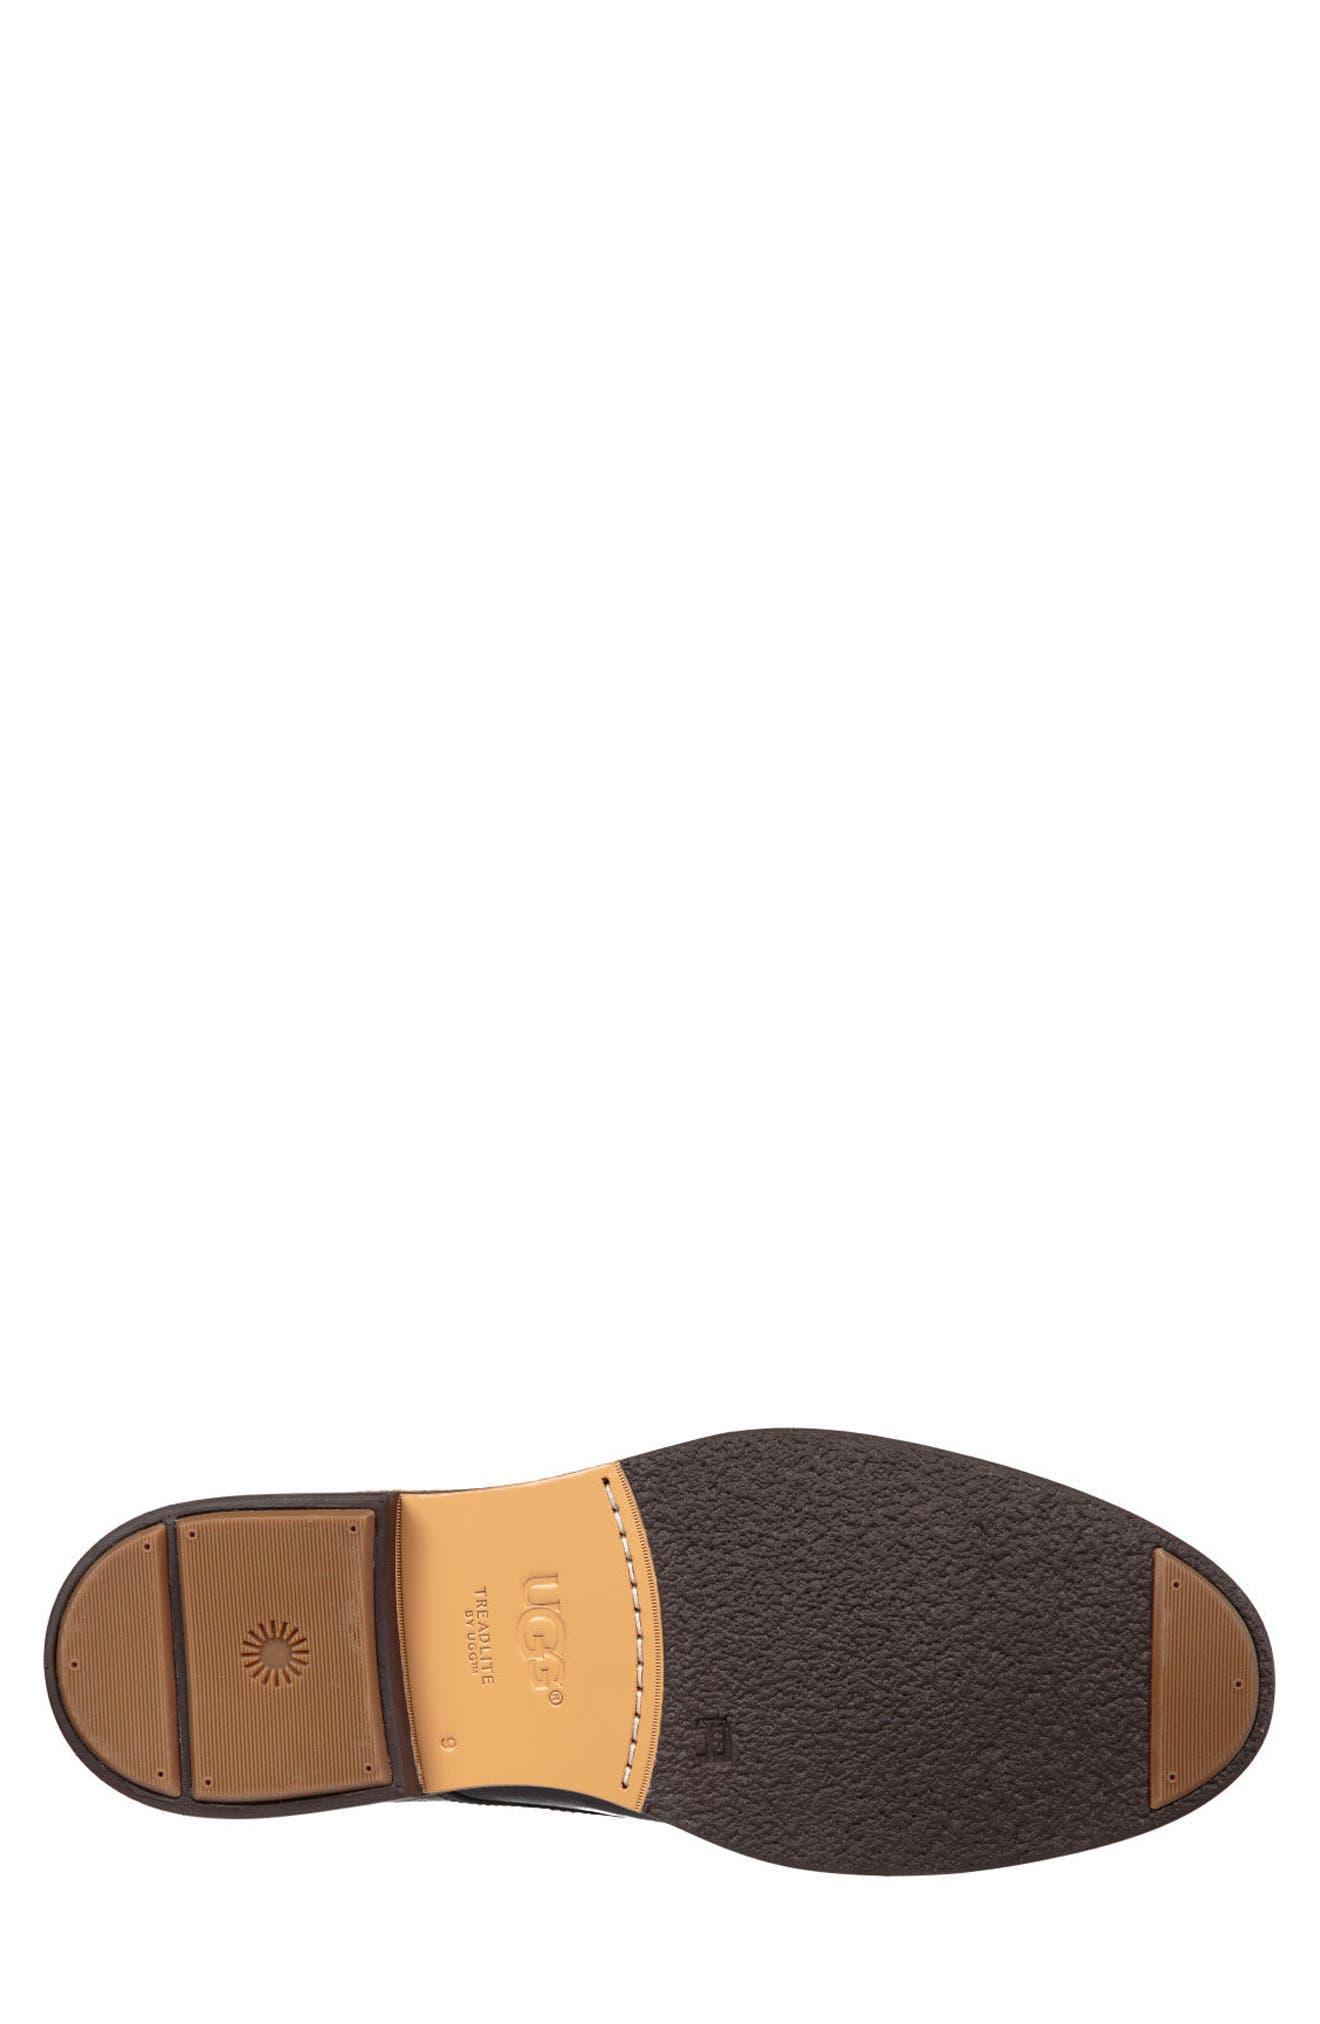 Jovin Buck Shoe,                             Alternate thumbnail 5, color,                             BLACK LEATHER/SUEDE